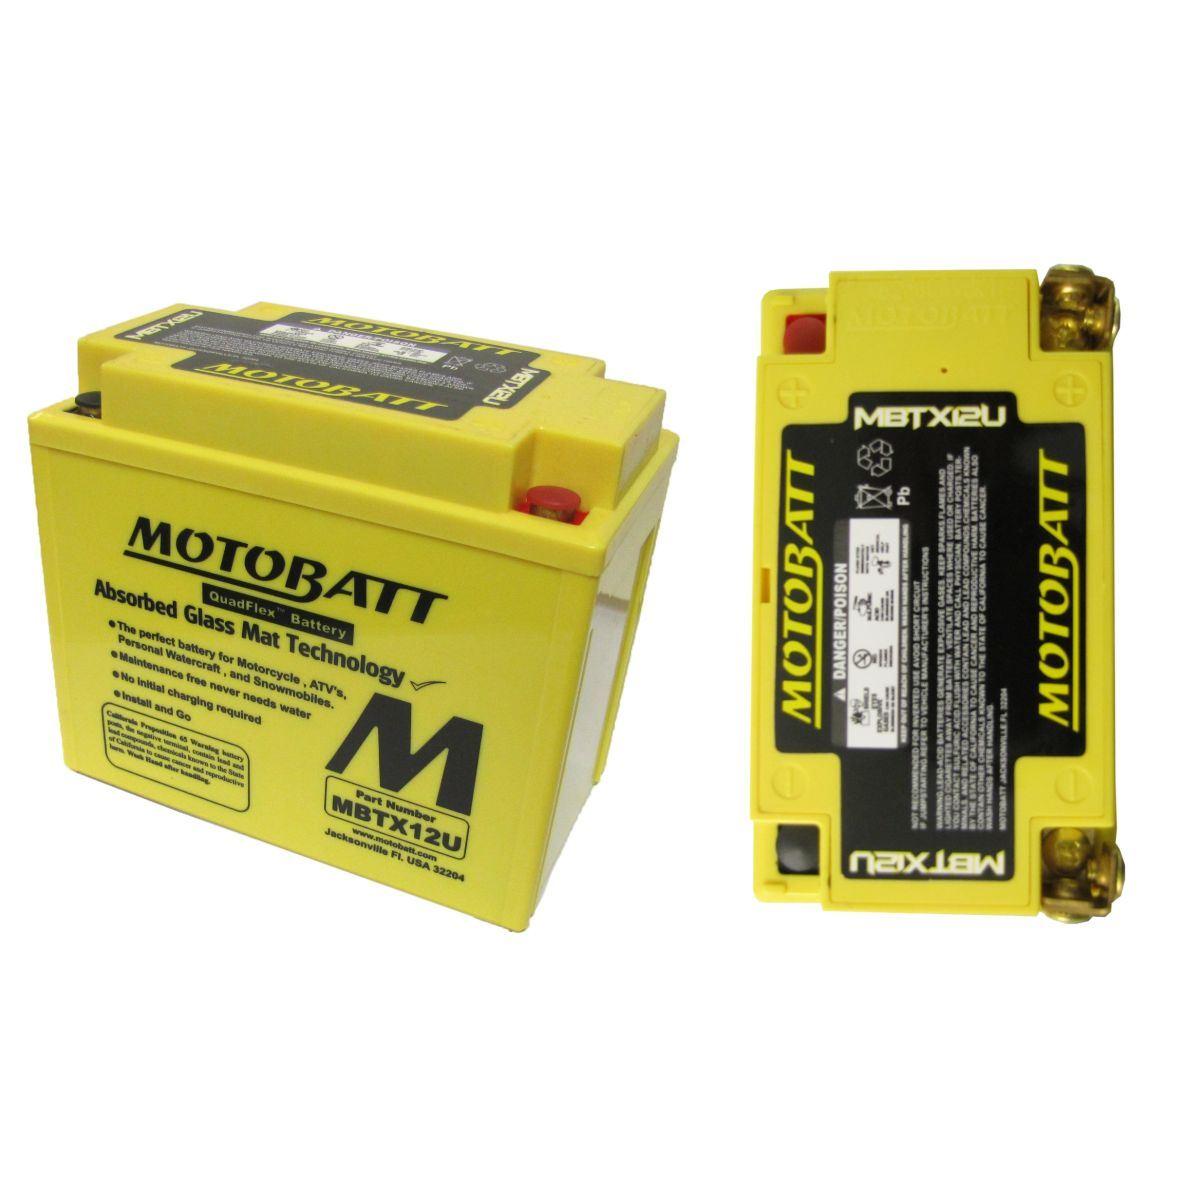 Battery-Motobatt-for-1999-Bimota-YB11-1100cc